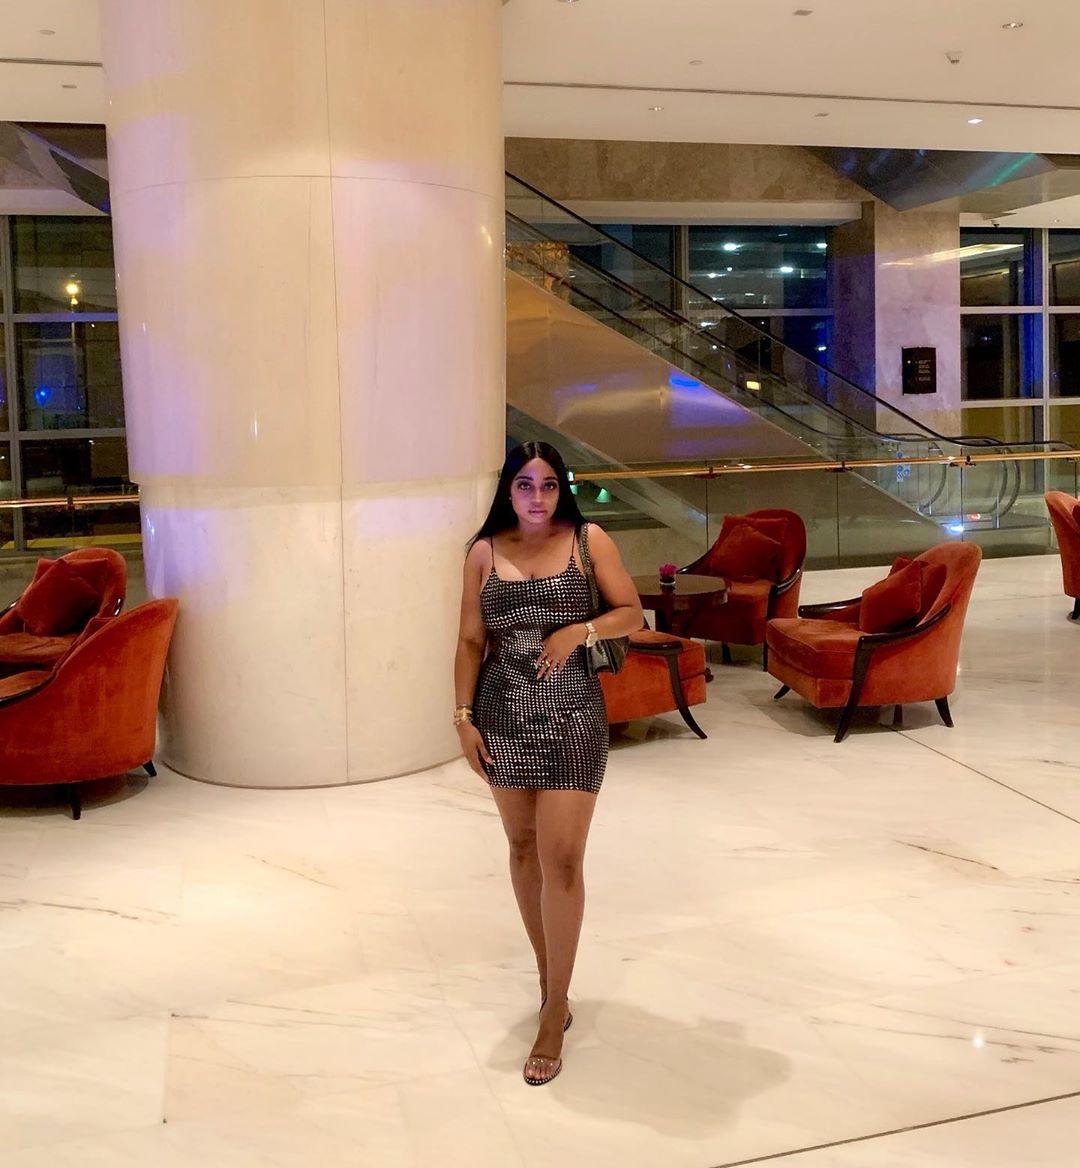 tracy-nwapa-fashion-style-dress-instagram-age-lagos-nigeria